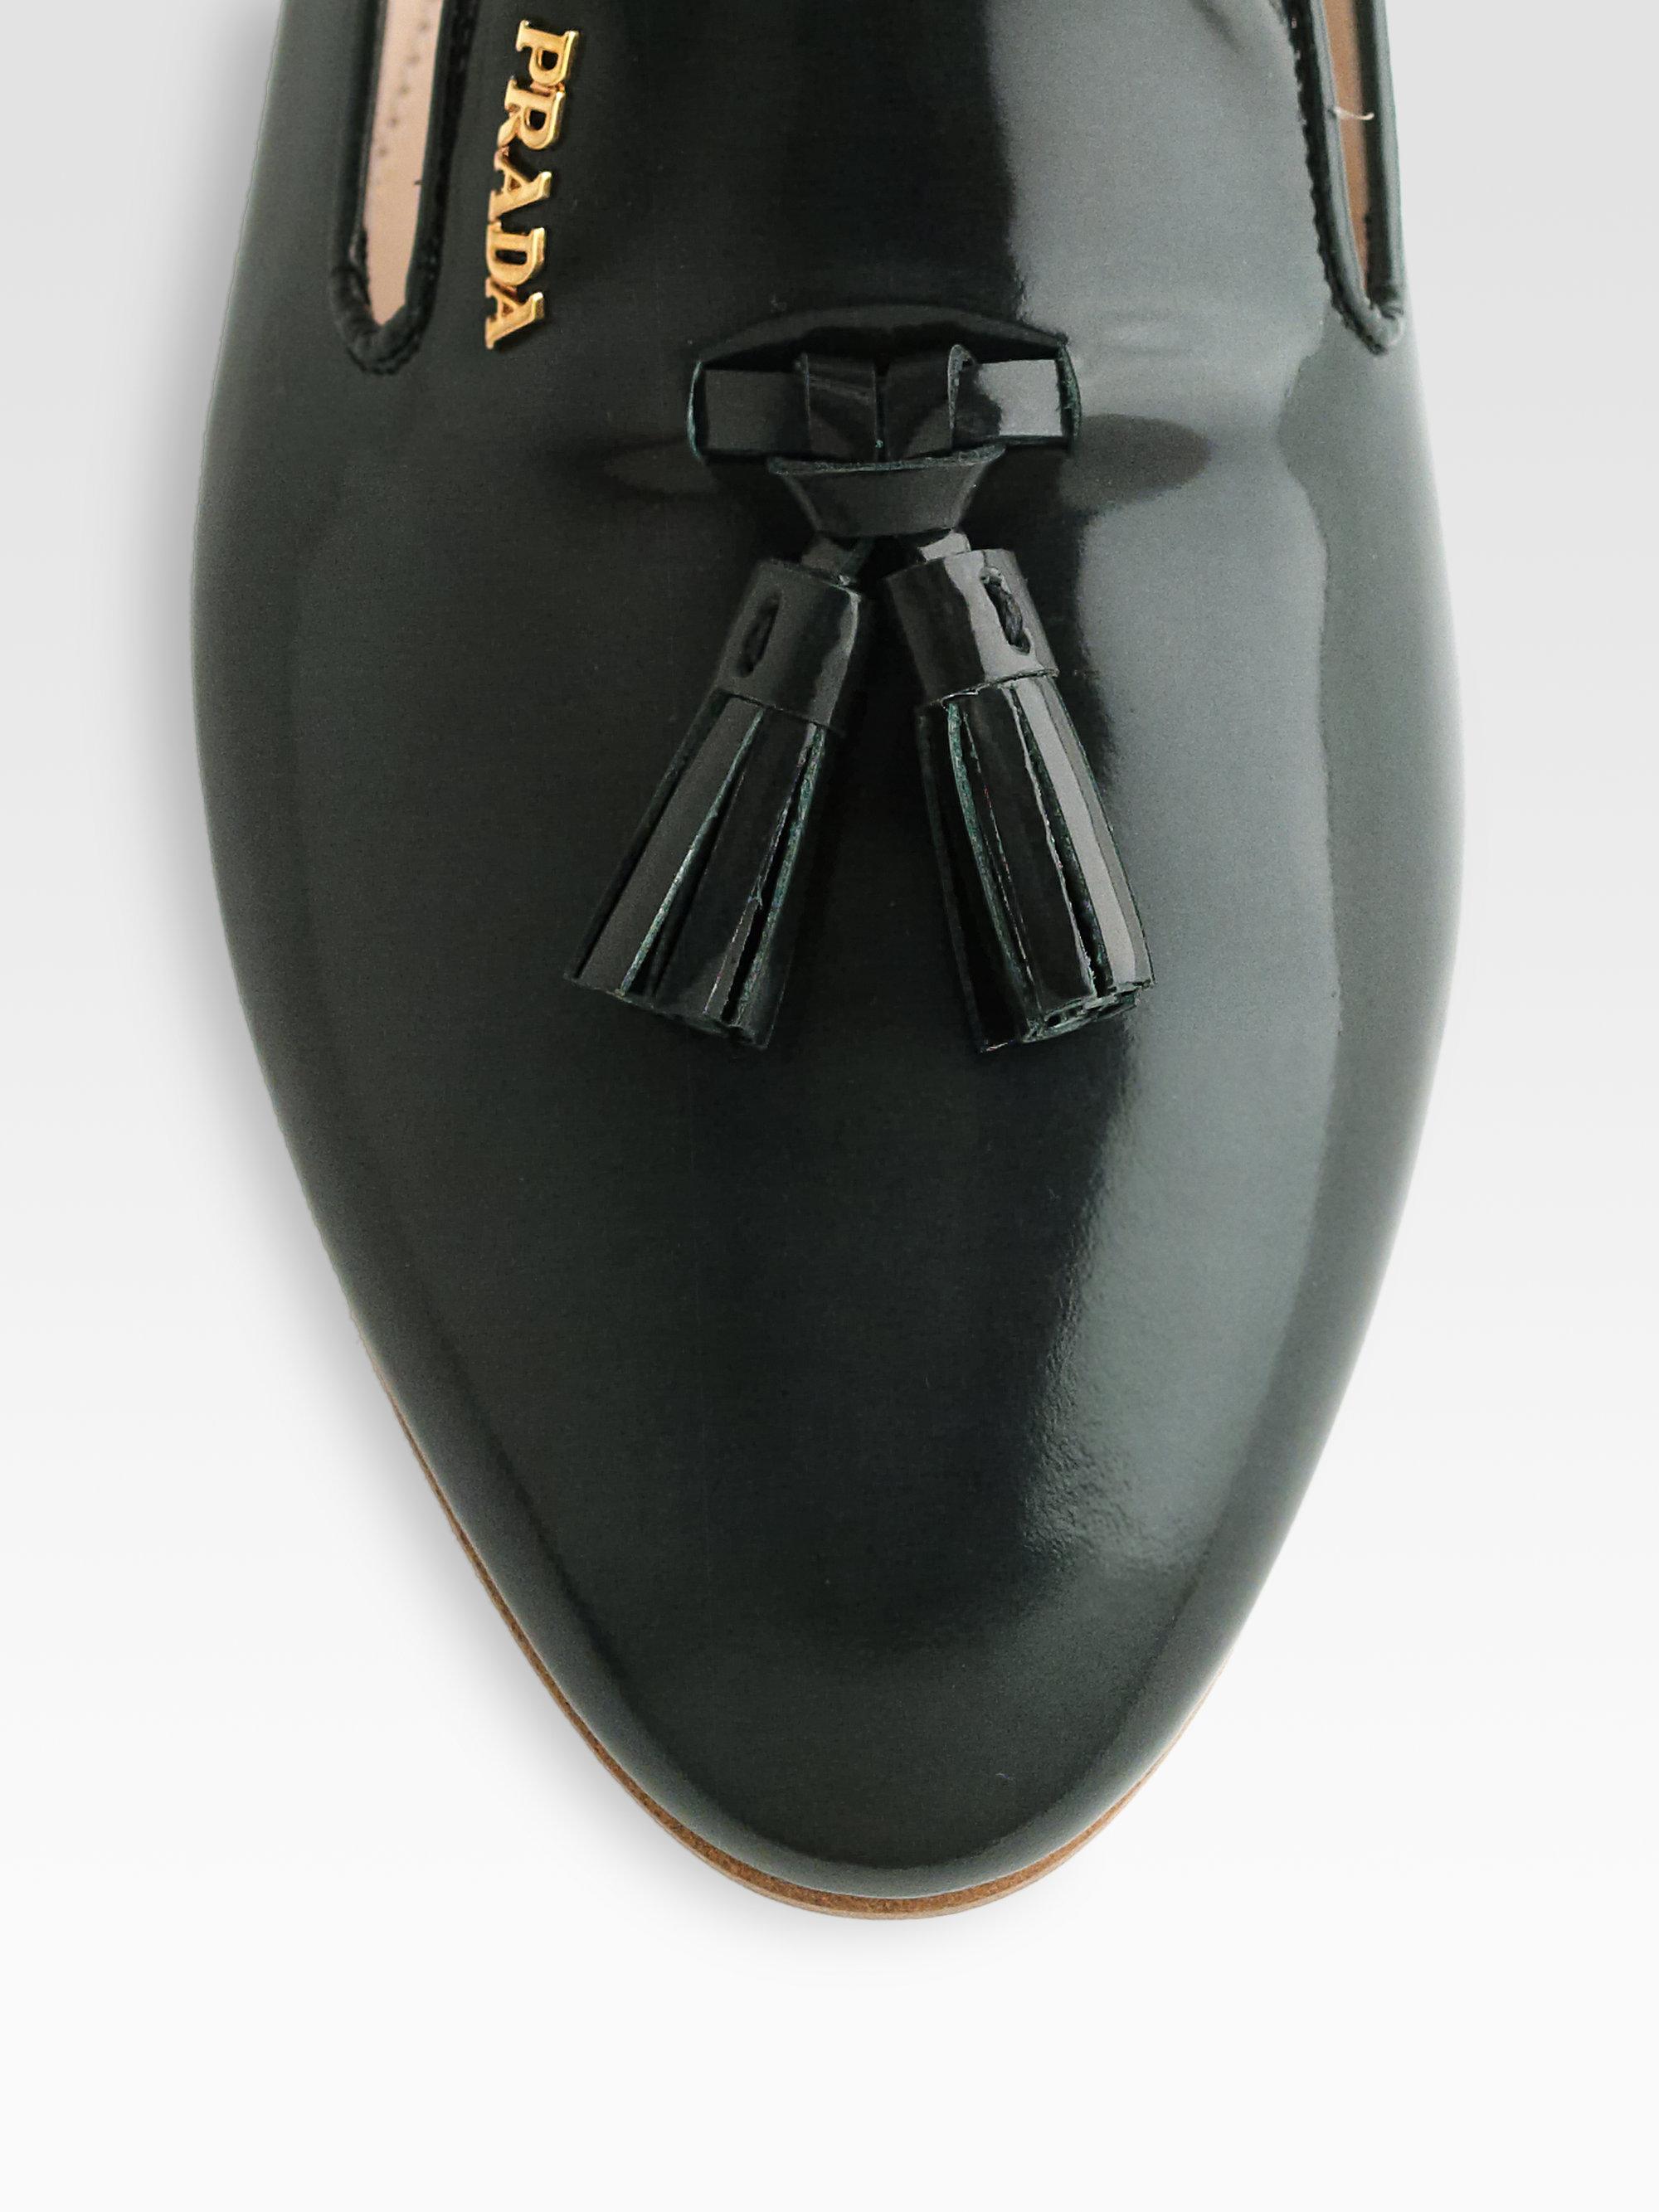 Prada Patent Leather Tassel Smoking Slippers in Green | Lyst